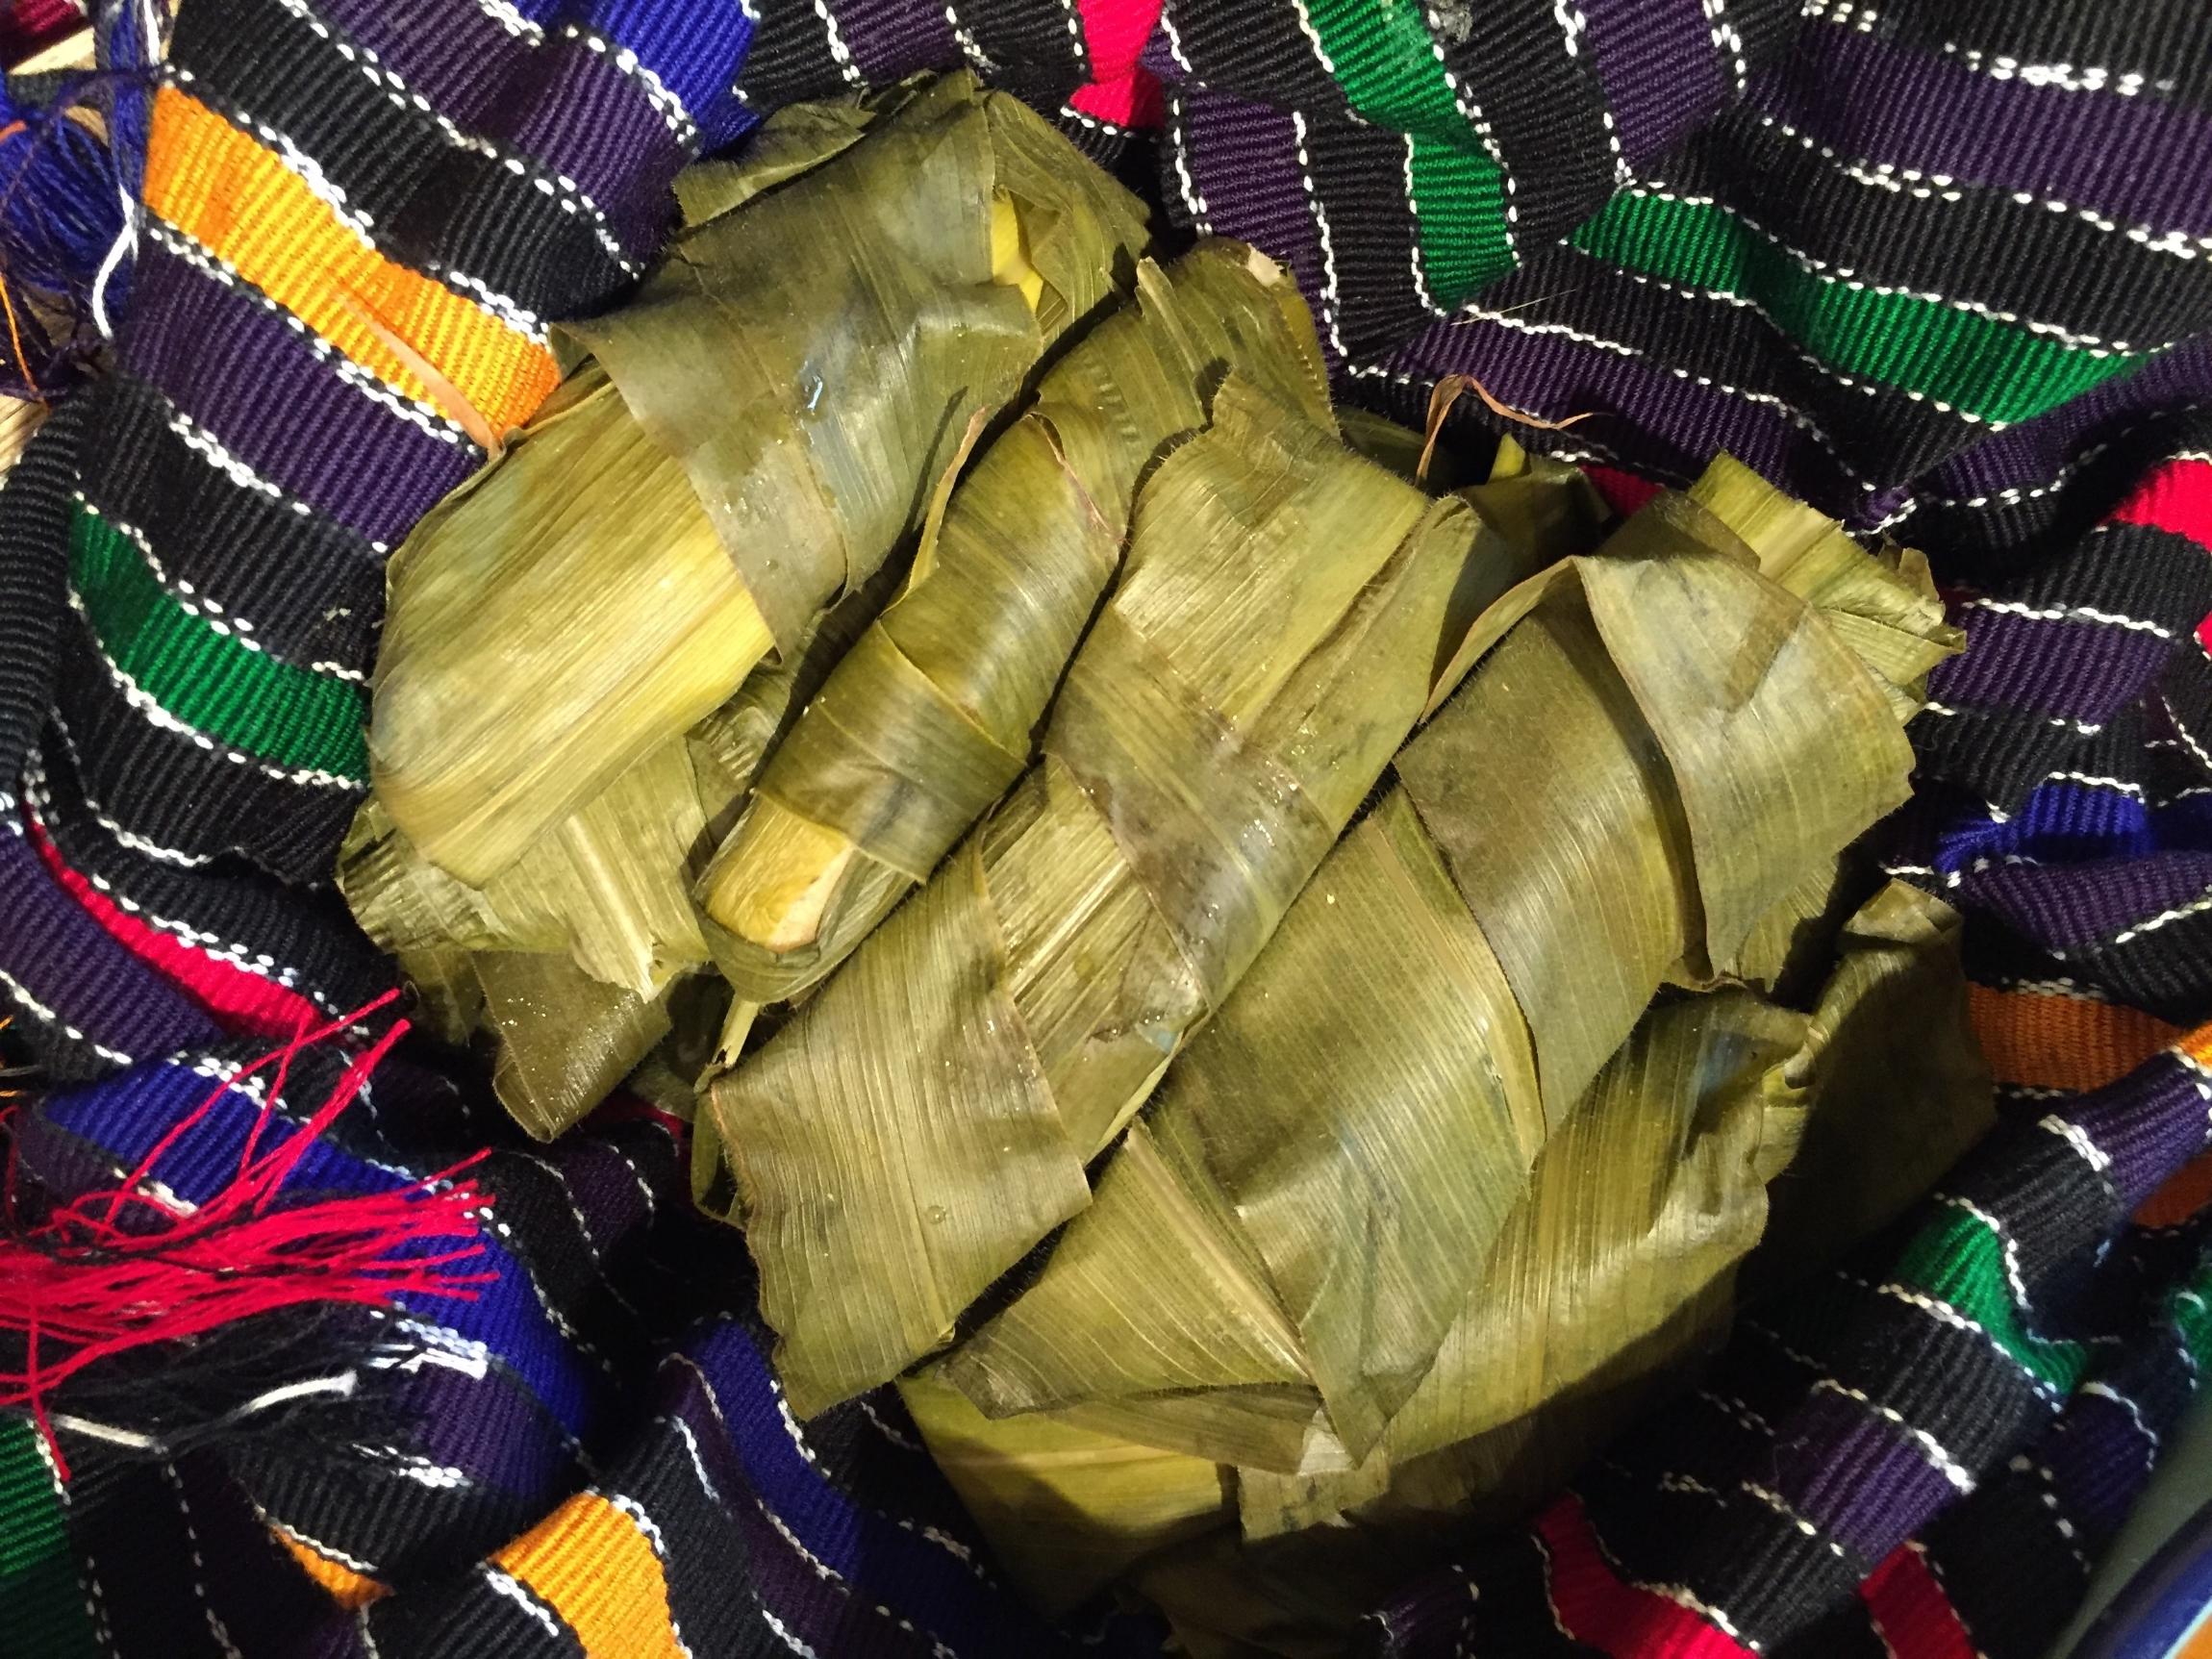 Twenty tamales